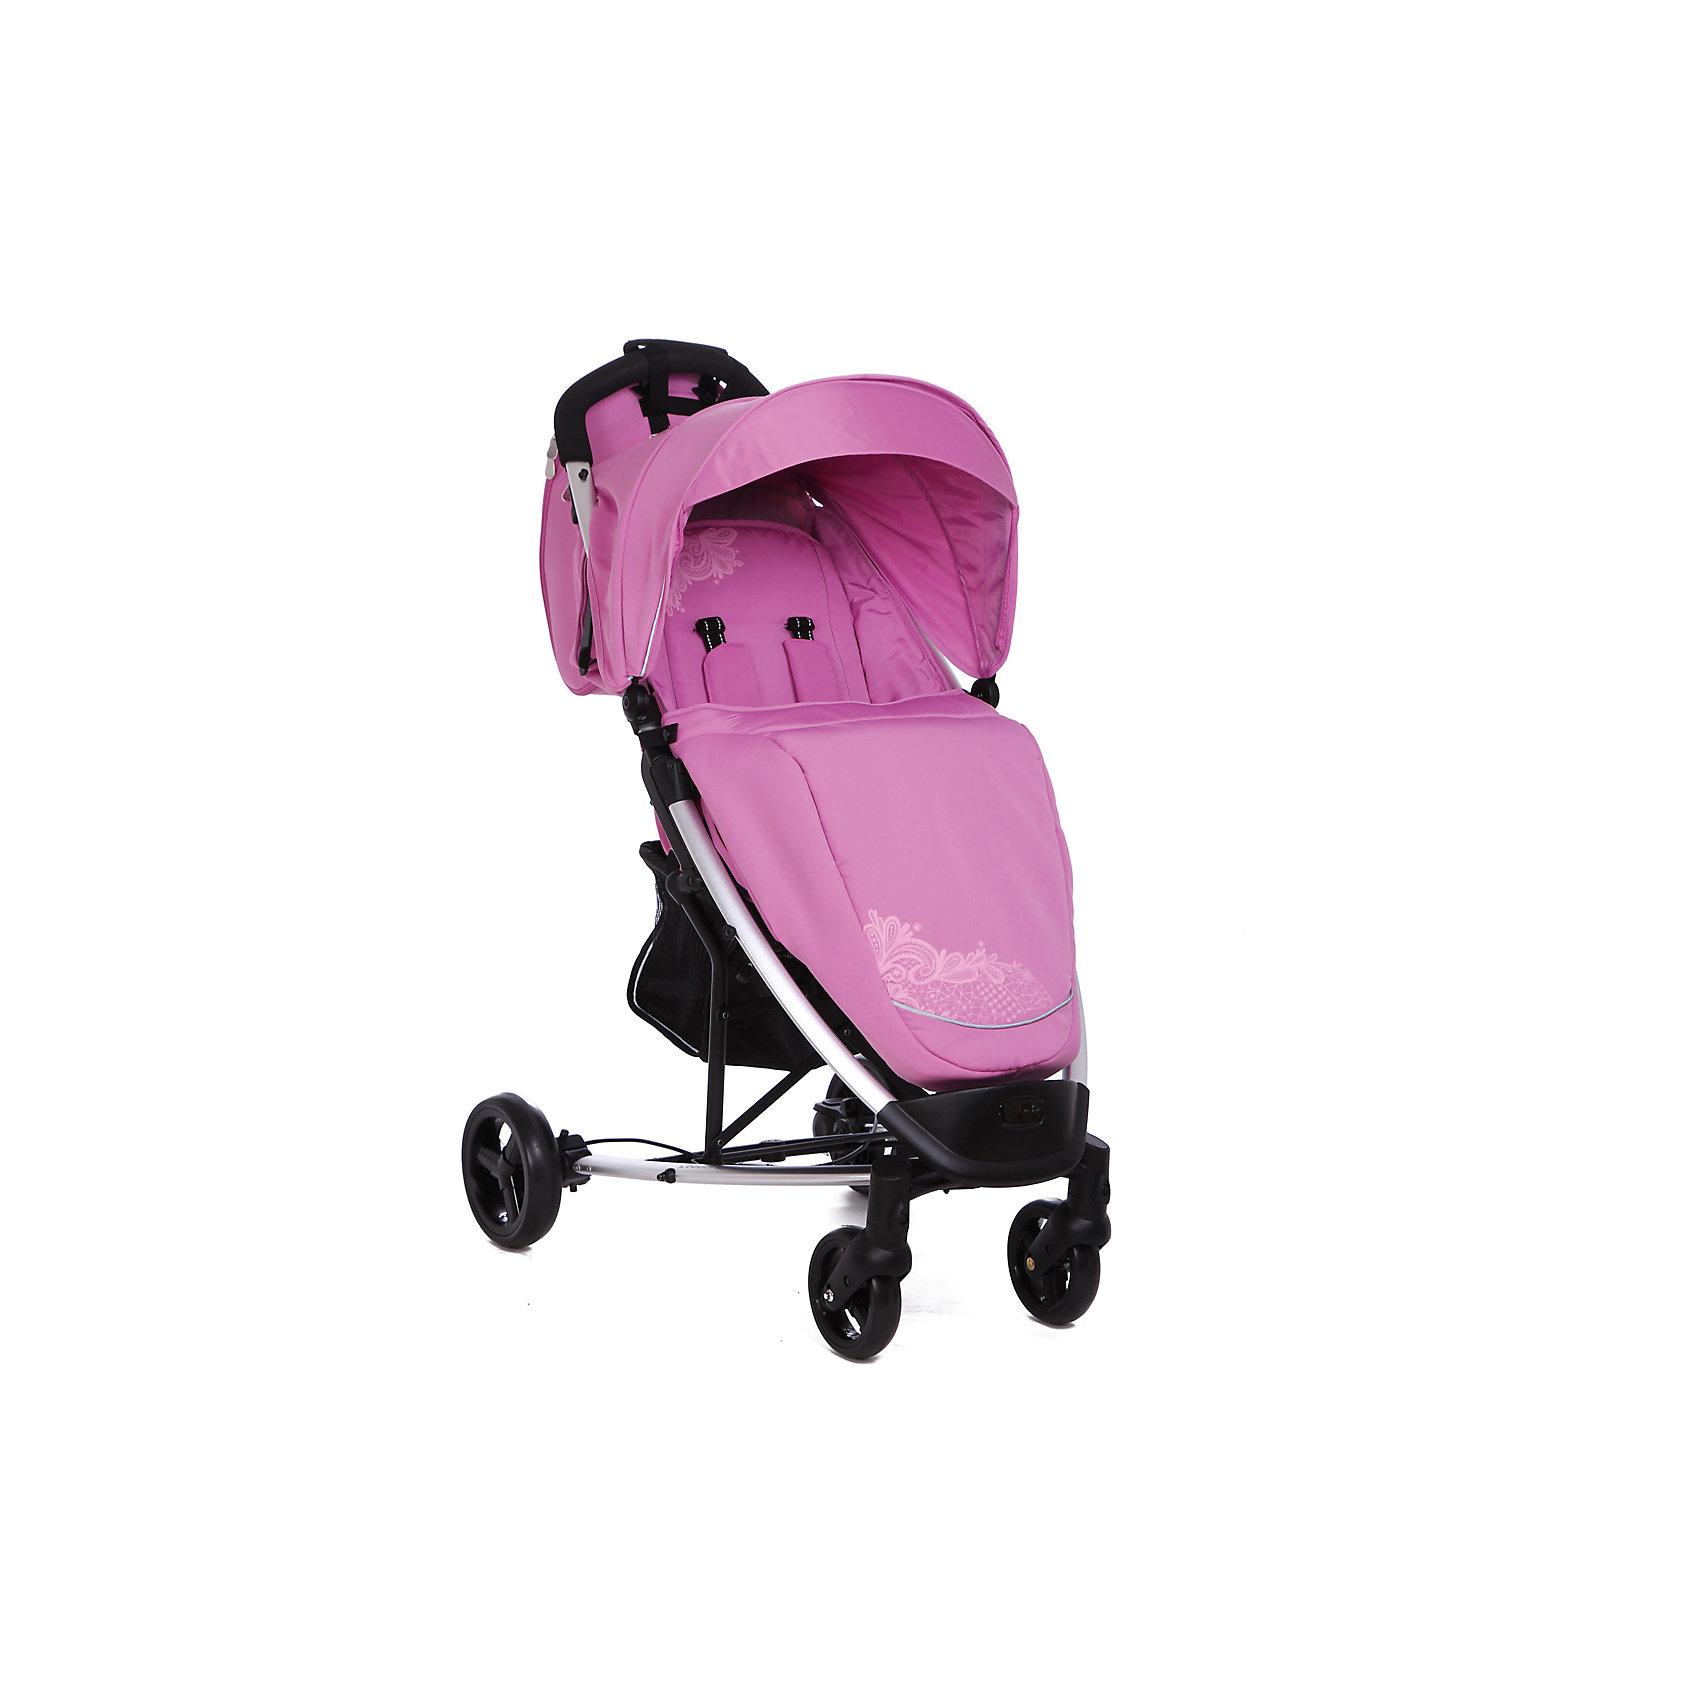 Прогулочная коляска S801L Leader kids , розовый/кружево